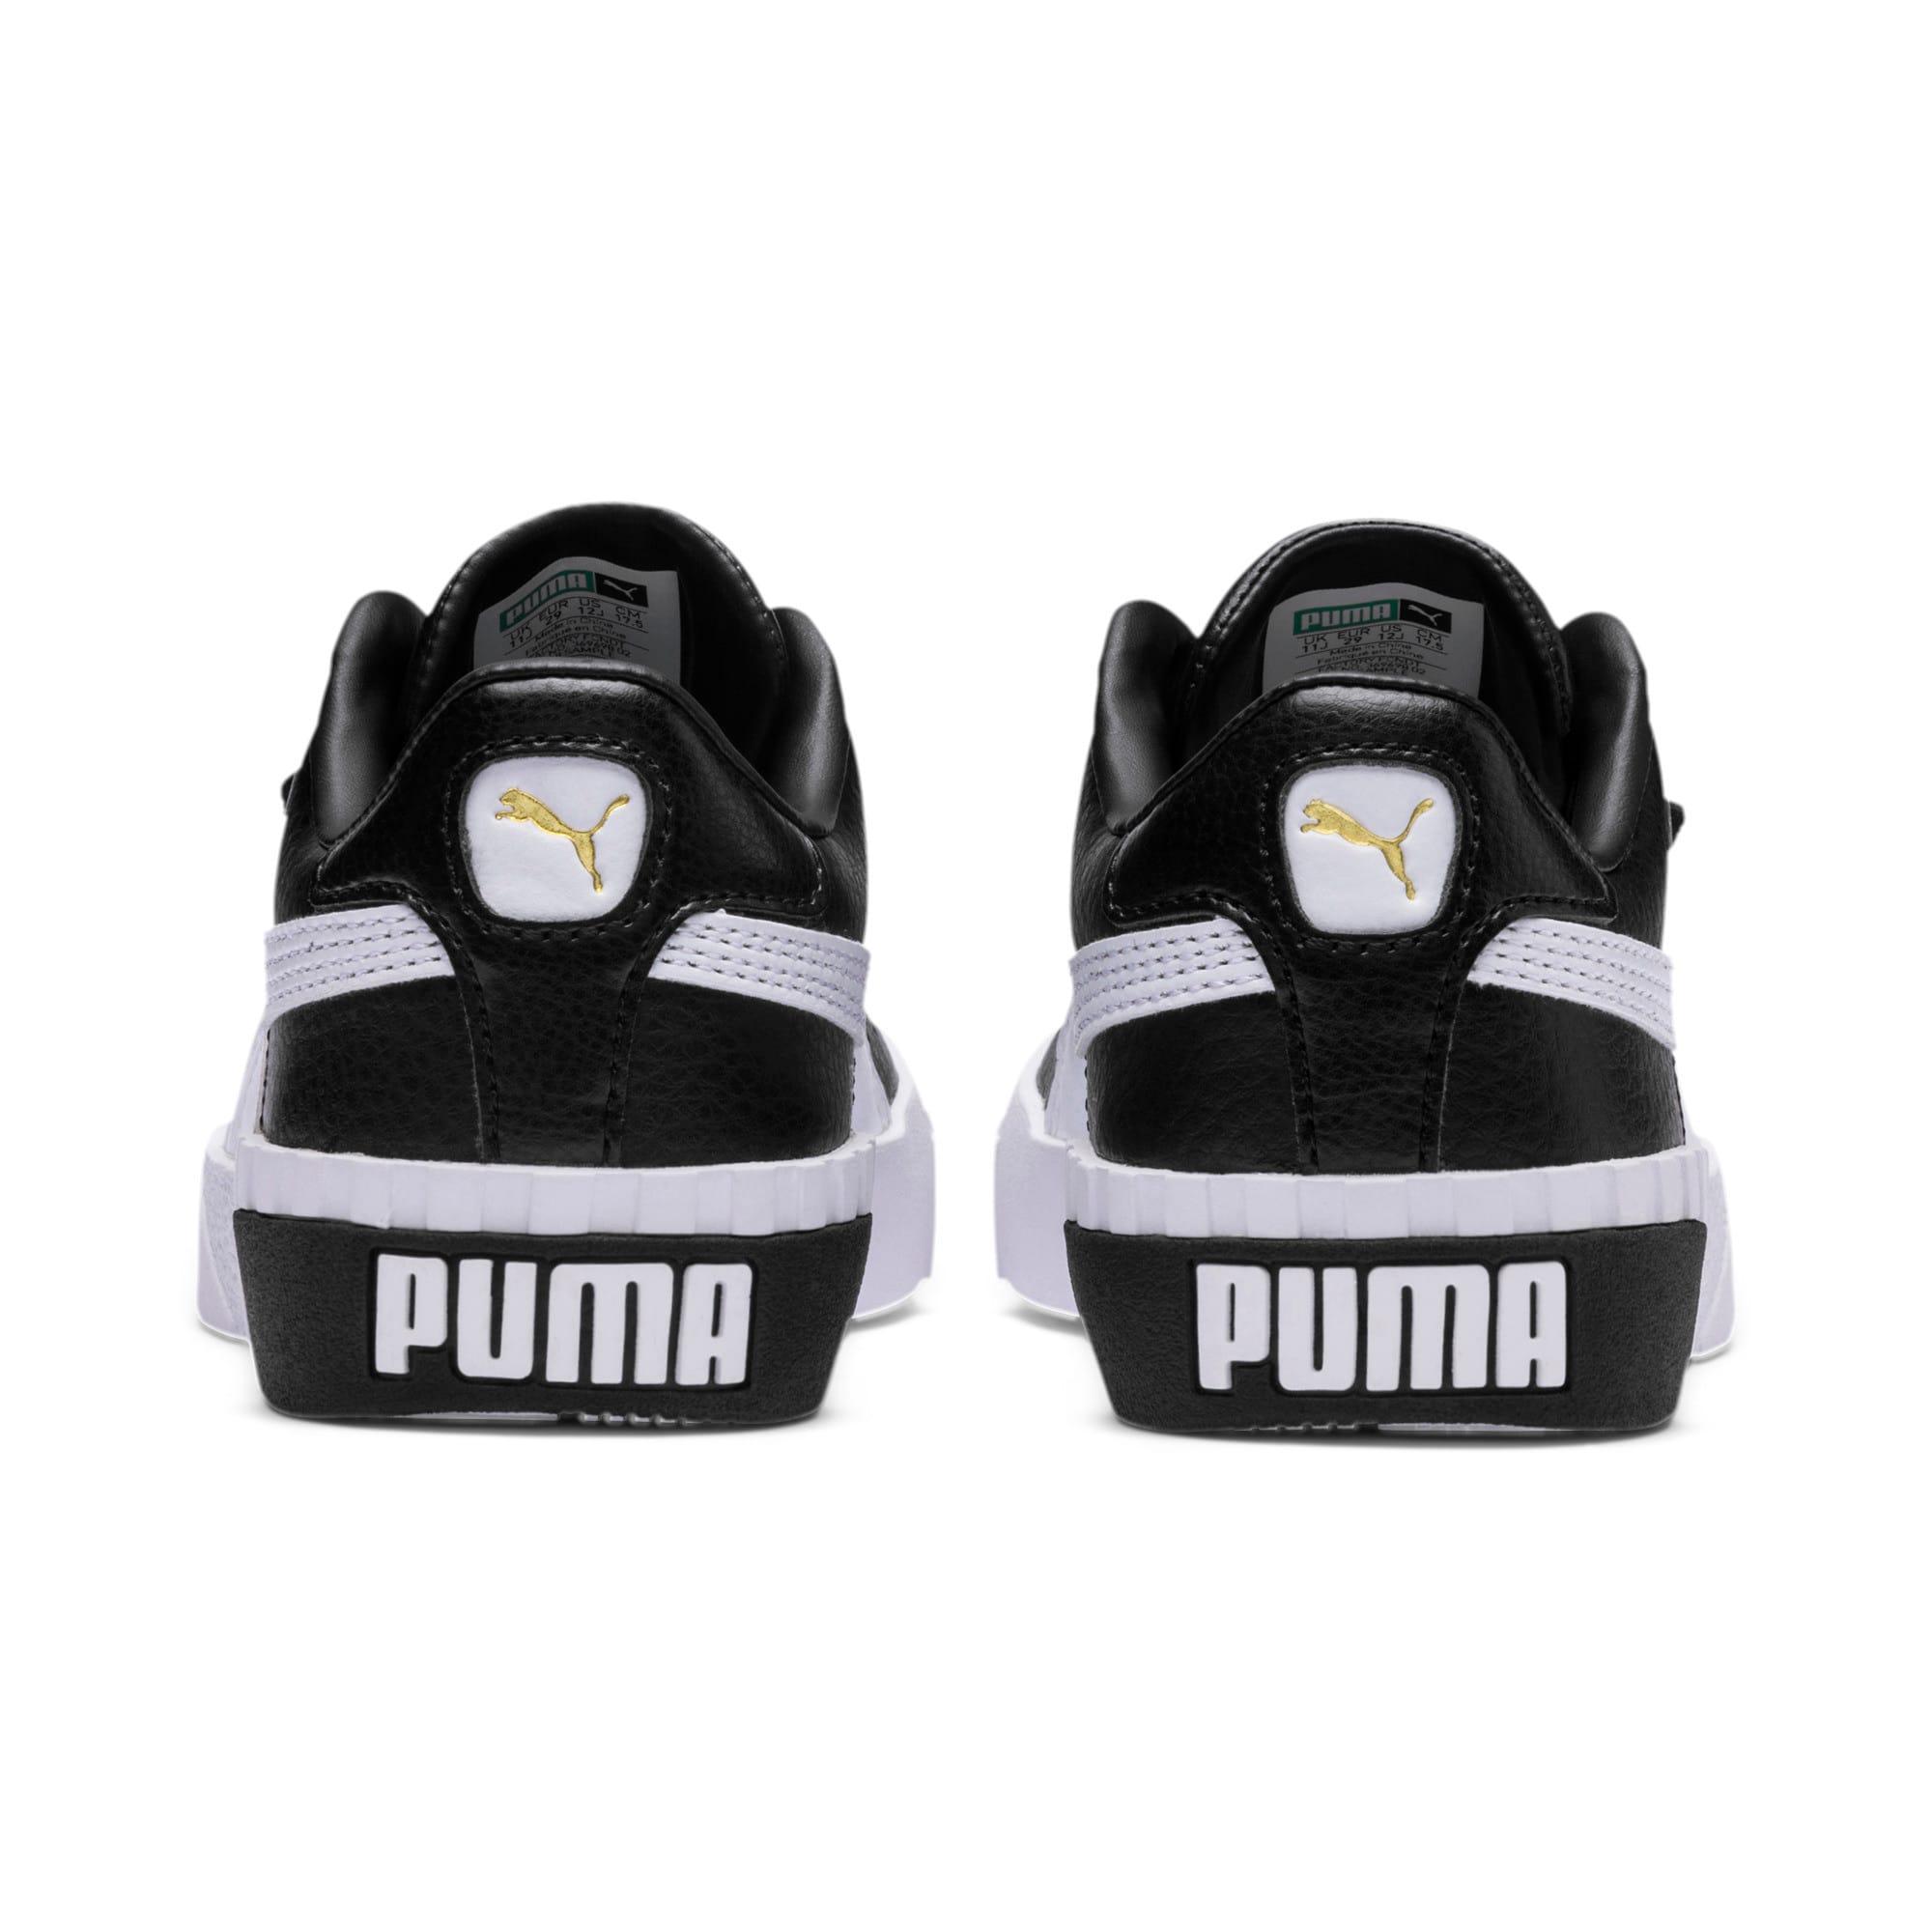 Thumbnail 3 of Cali Kids' Mädchen Sneaker, Puma Black-Puma Team Gold, medium